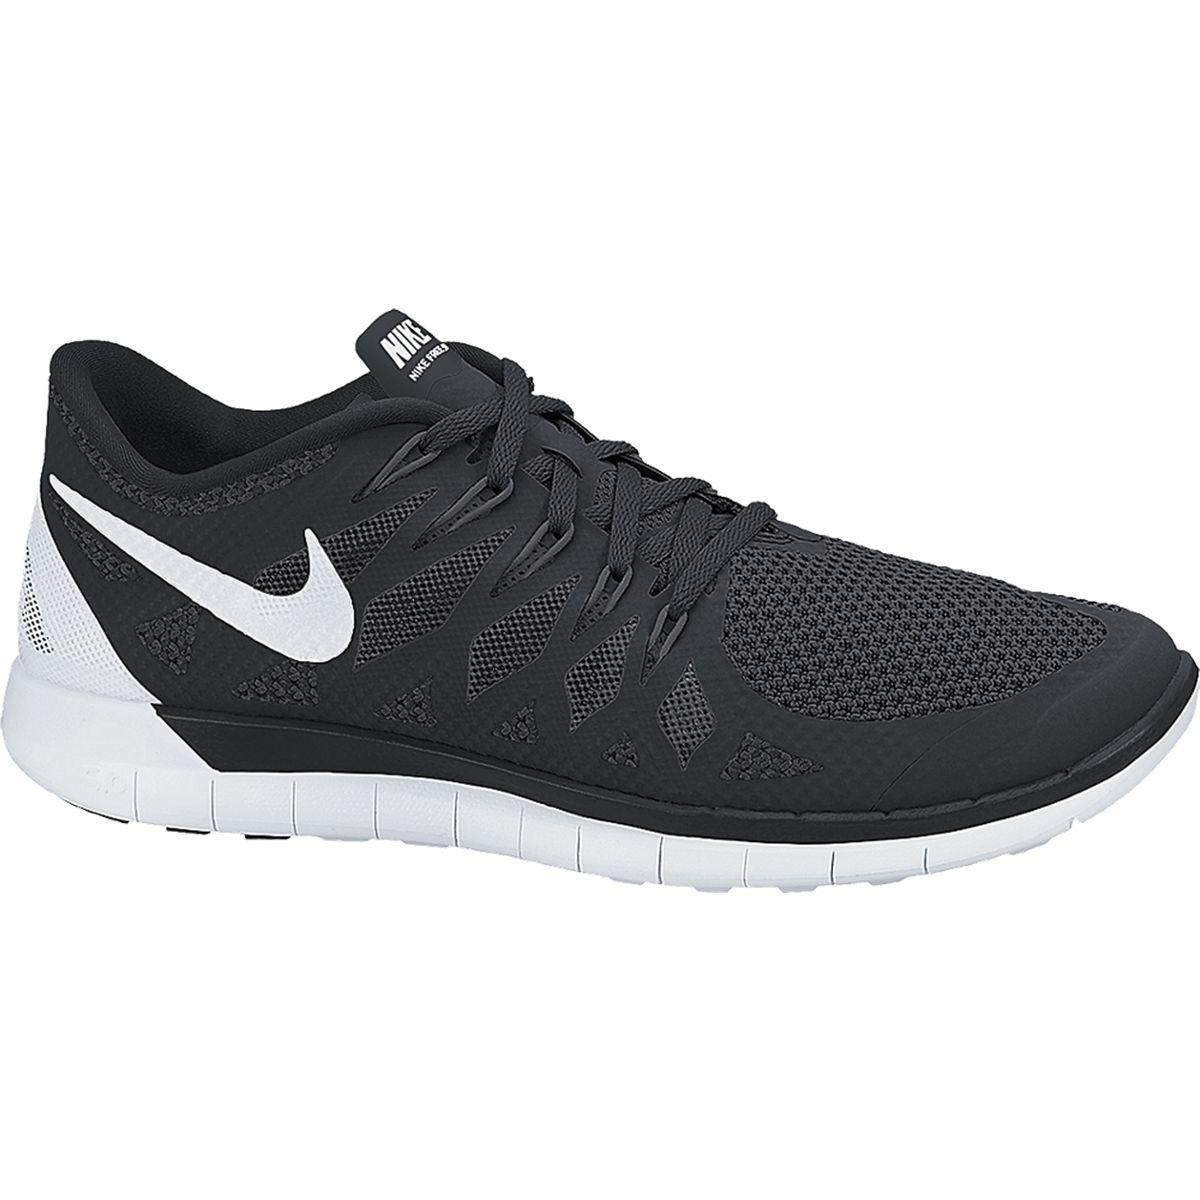 Nike Mens Free 5.0+ Running Shoes